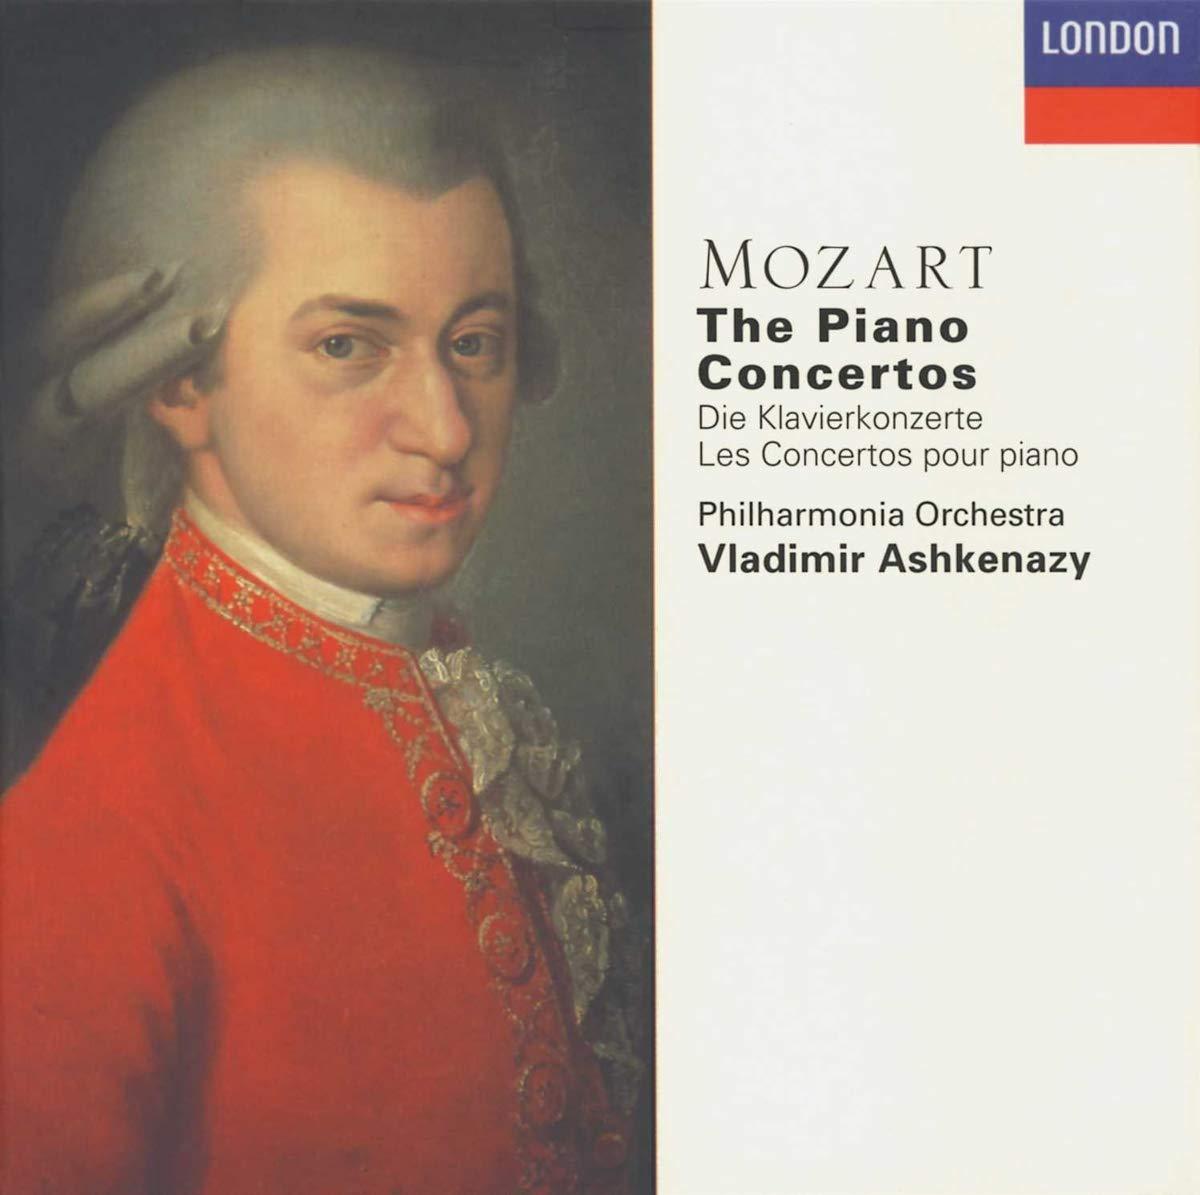 Klavierkonzerte 1-27 (Gesamtaufnahme) - Vladimir Ashkenazy, Wolfgang  Amadeus Mozart: Amazon.de: Musik